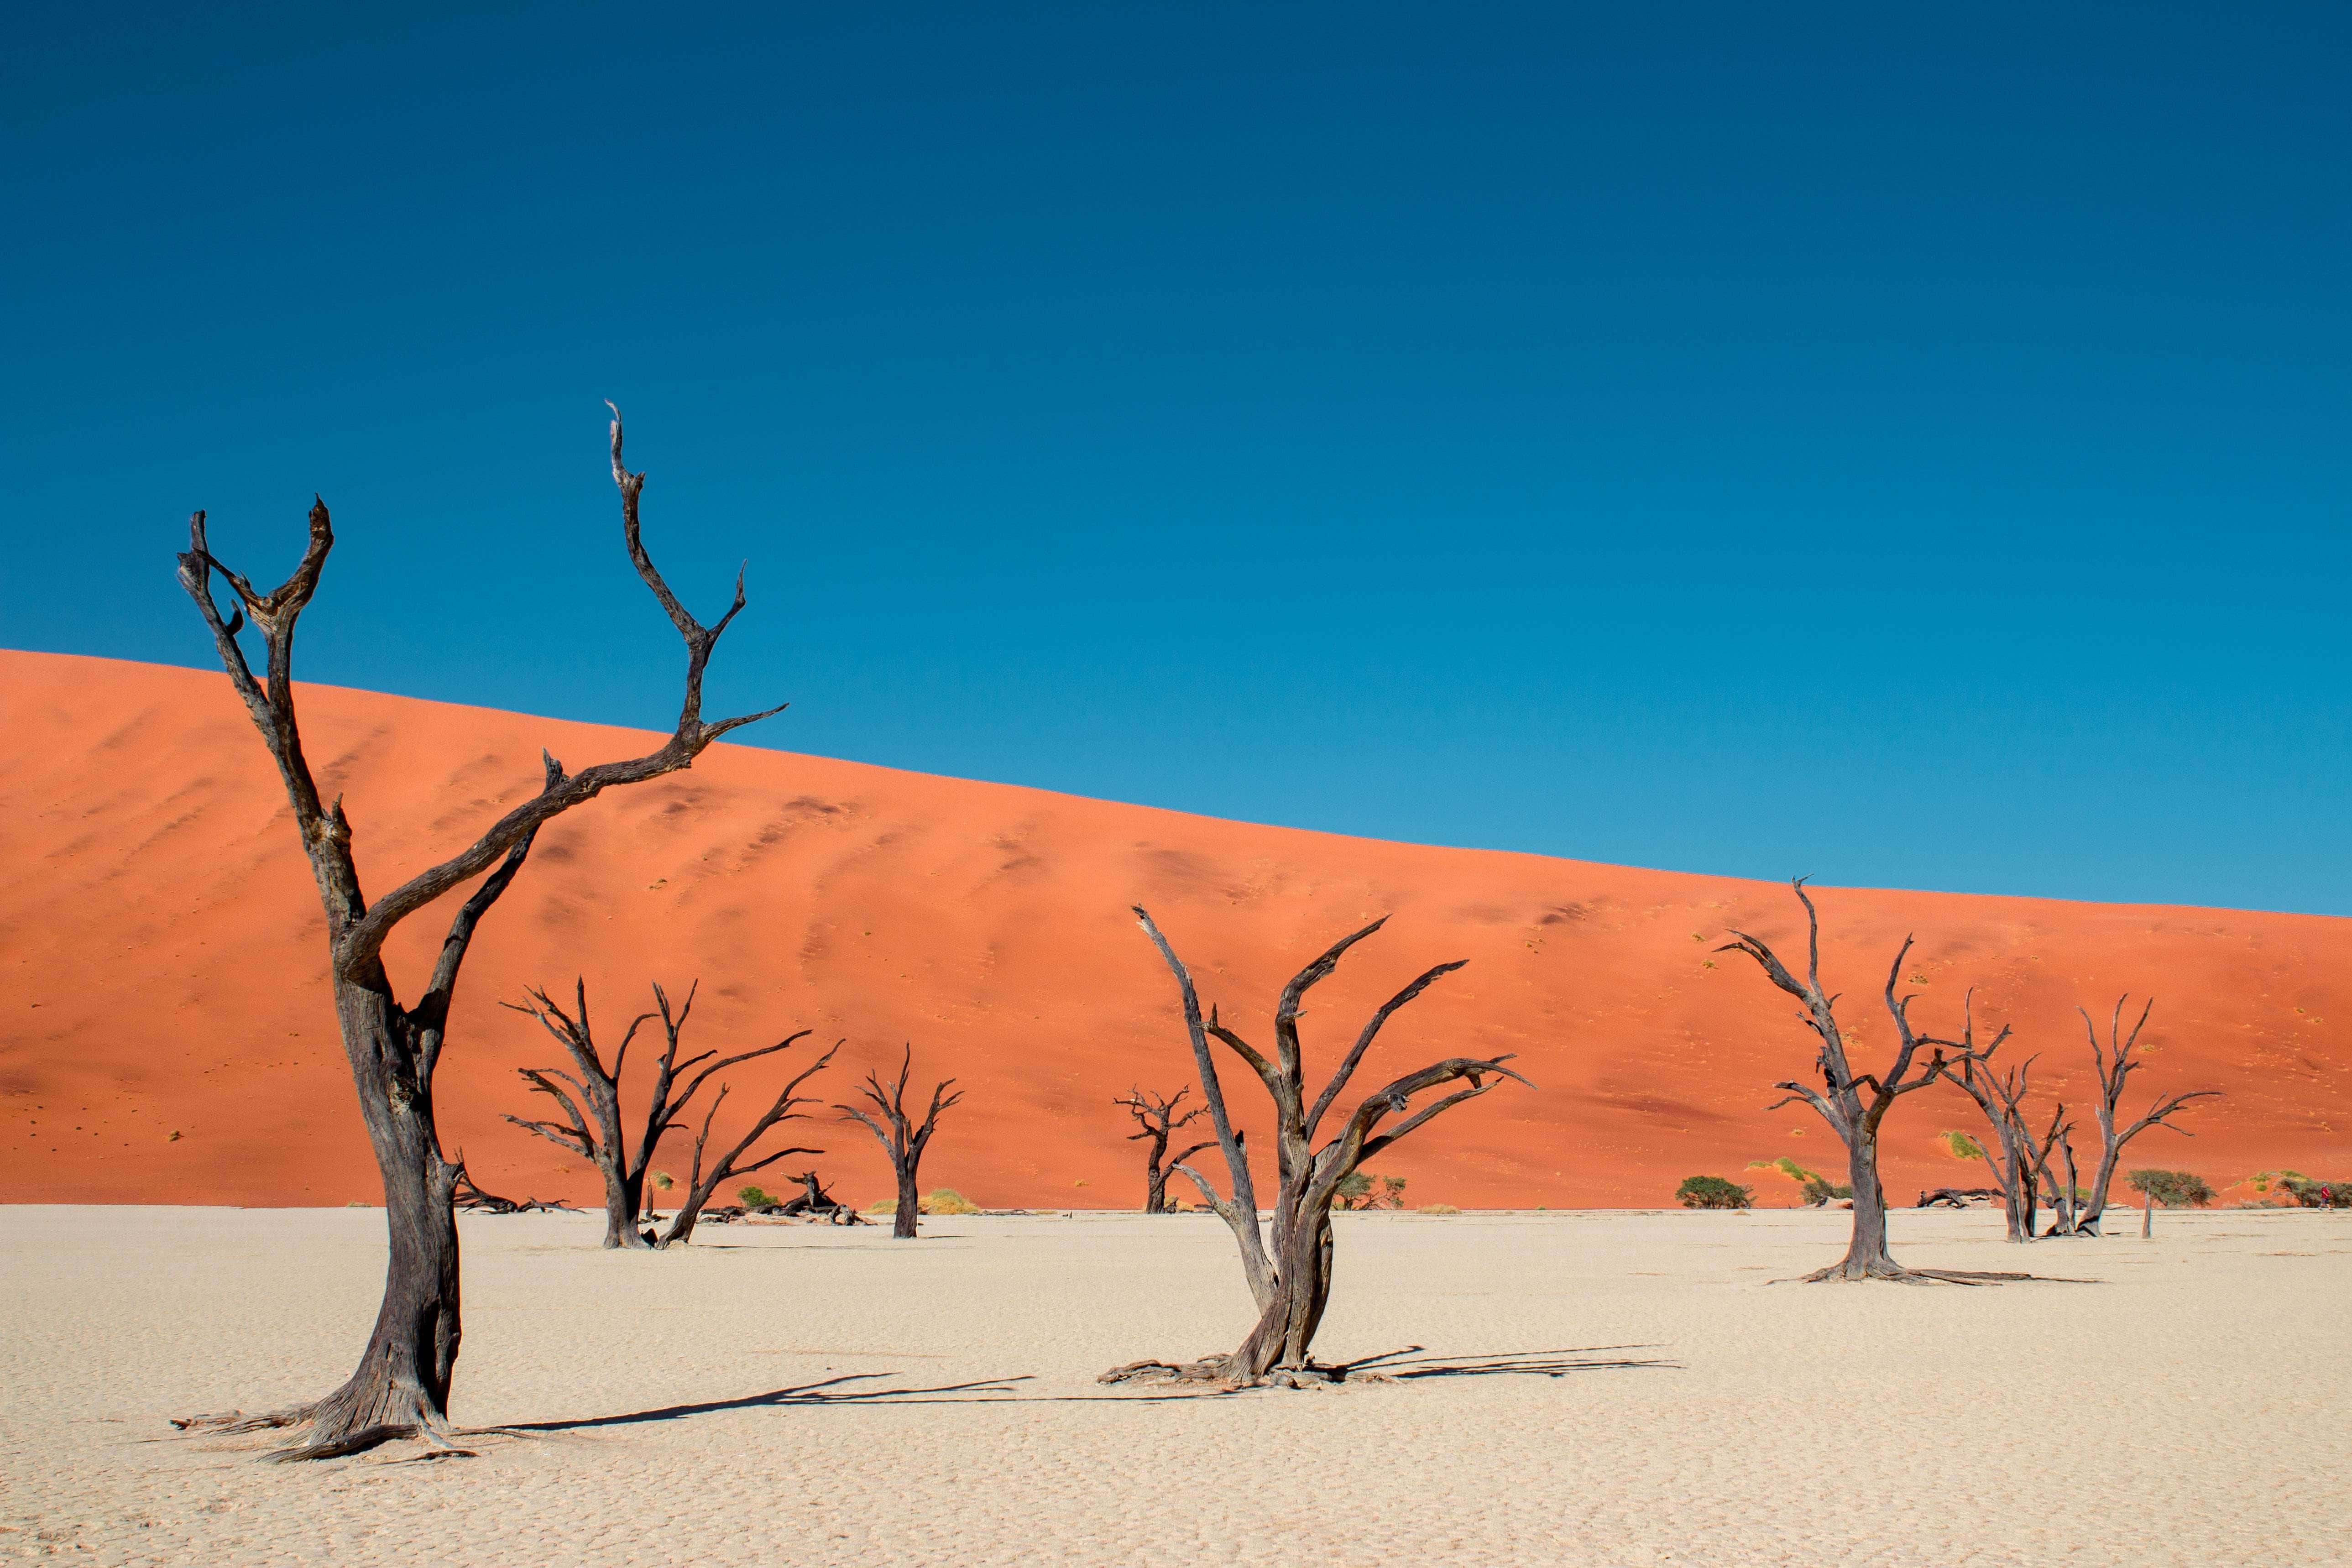 dead acacia trees in namibia on a white salt pan juxtaposed against orange sand dune